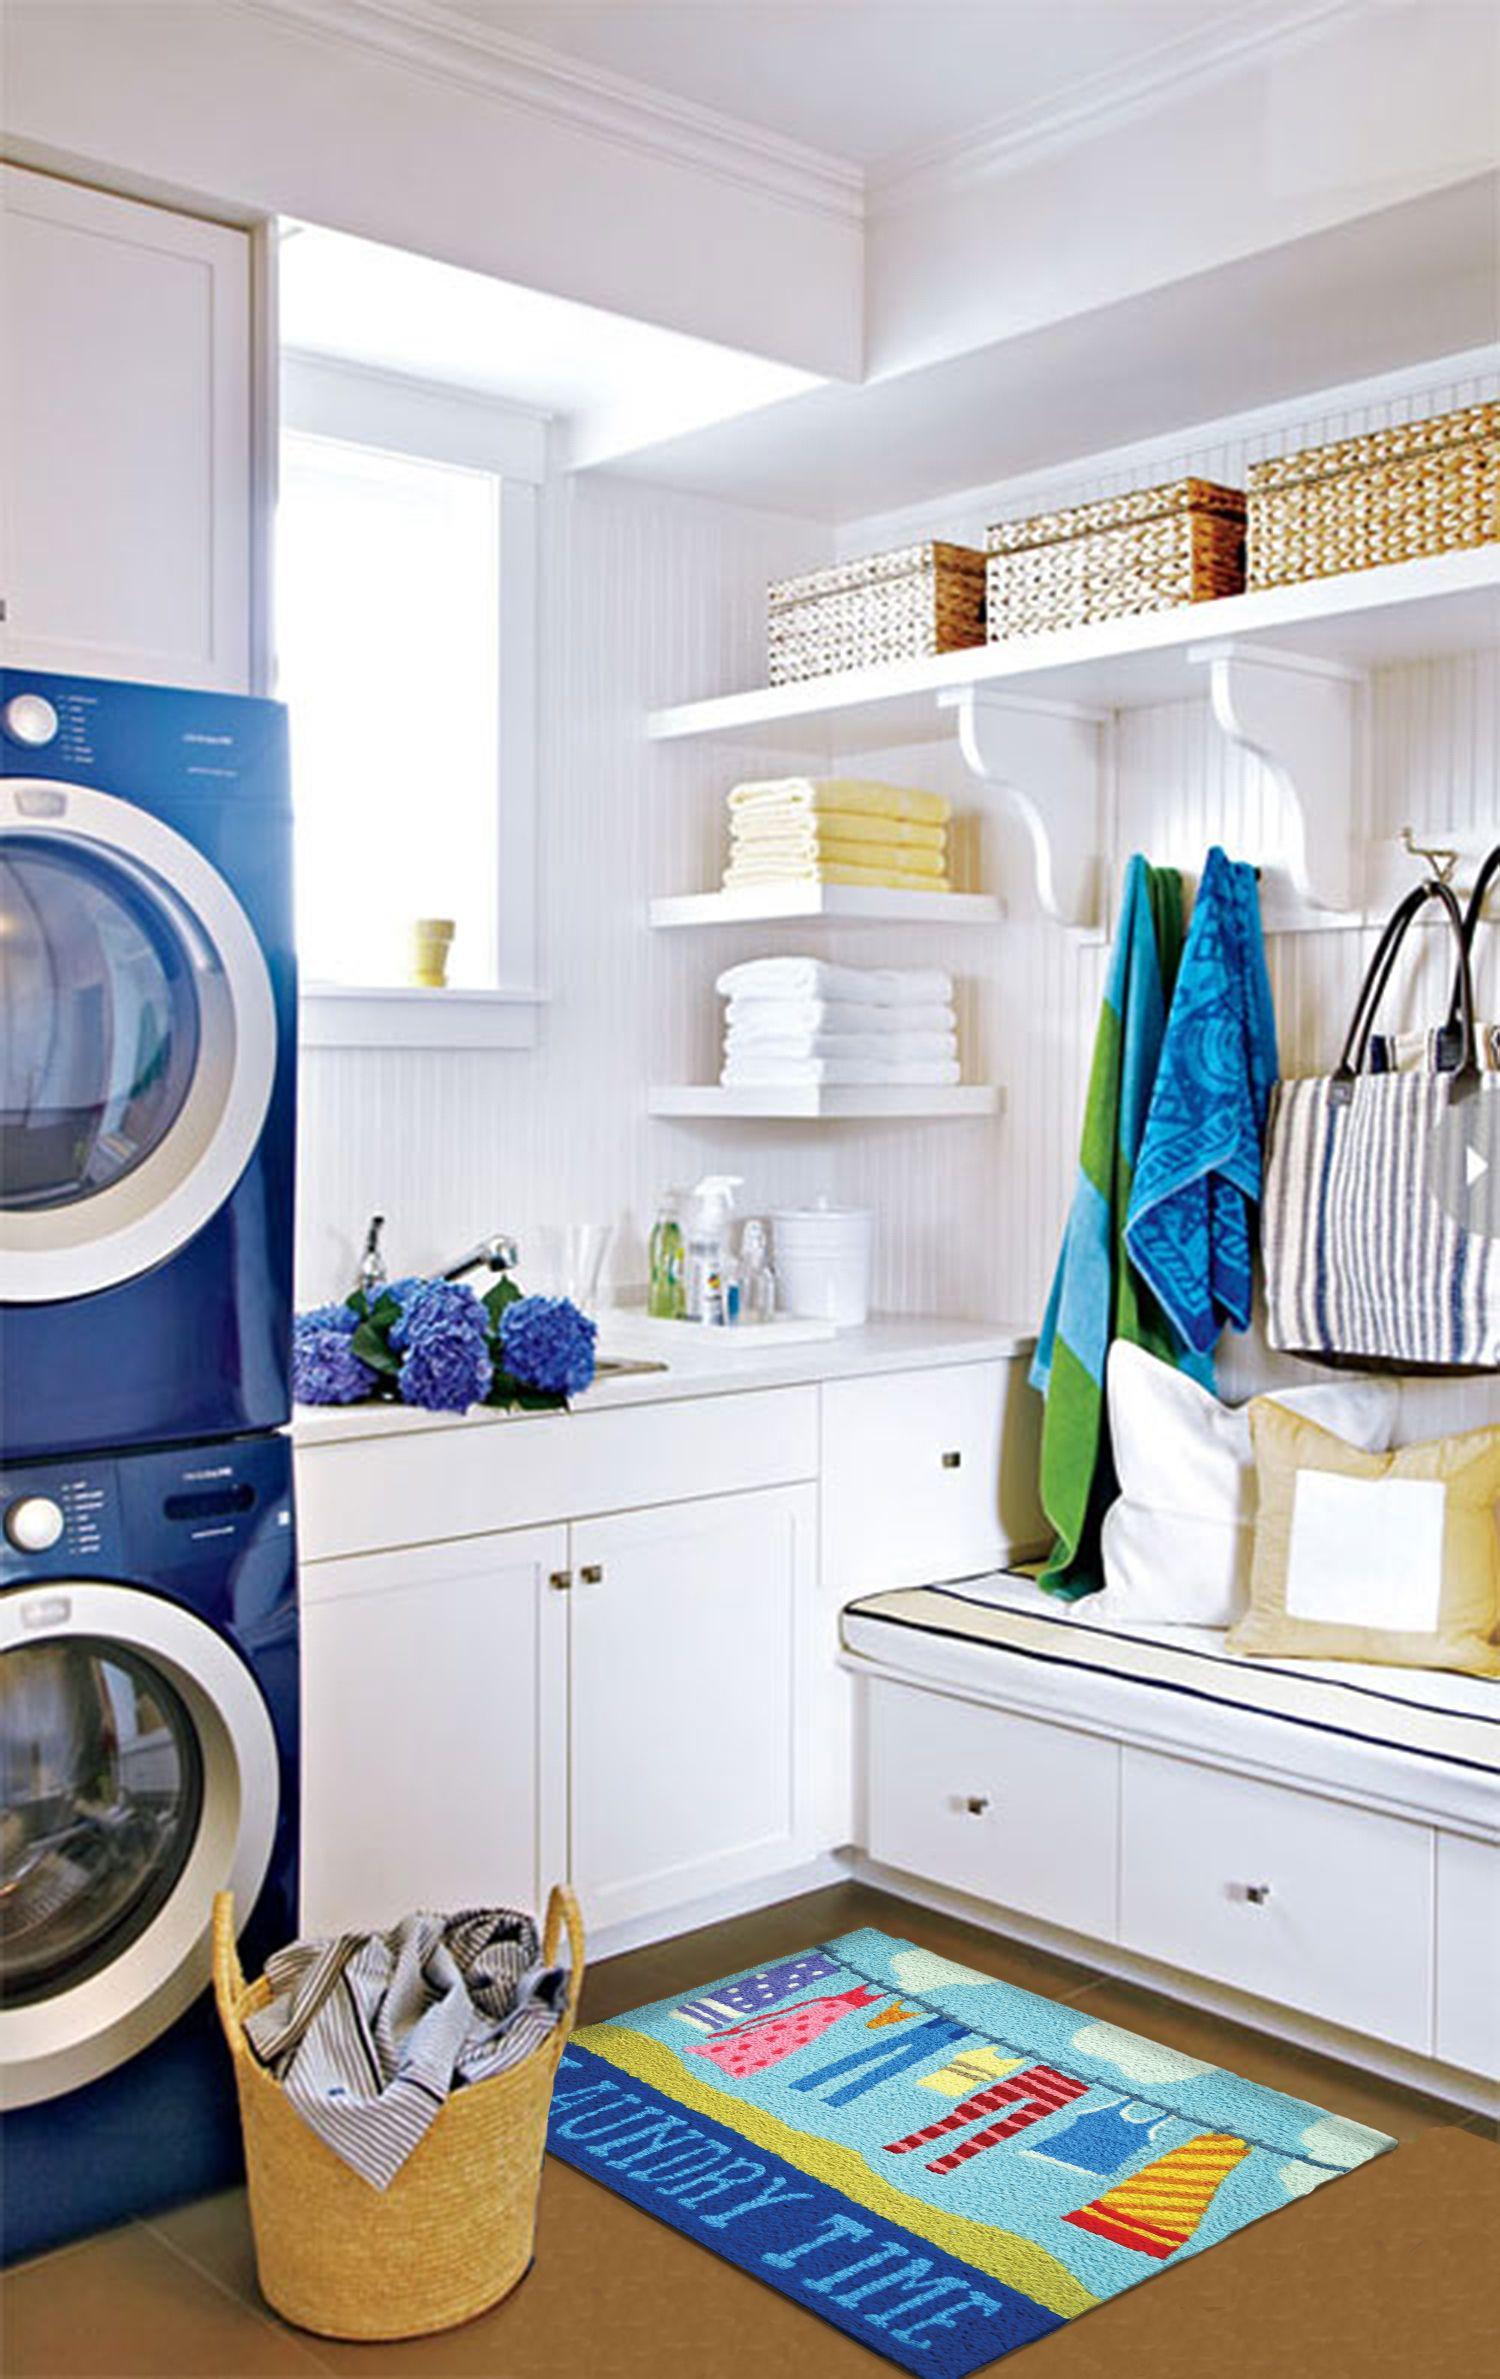 Laundry Time Jellybean Cuartos De Lavado Lavar Y Apartamentos ~ Lavar Cortinas Blancas Muy Sucias